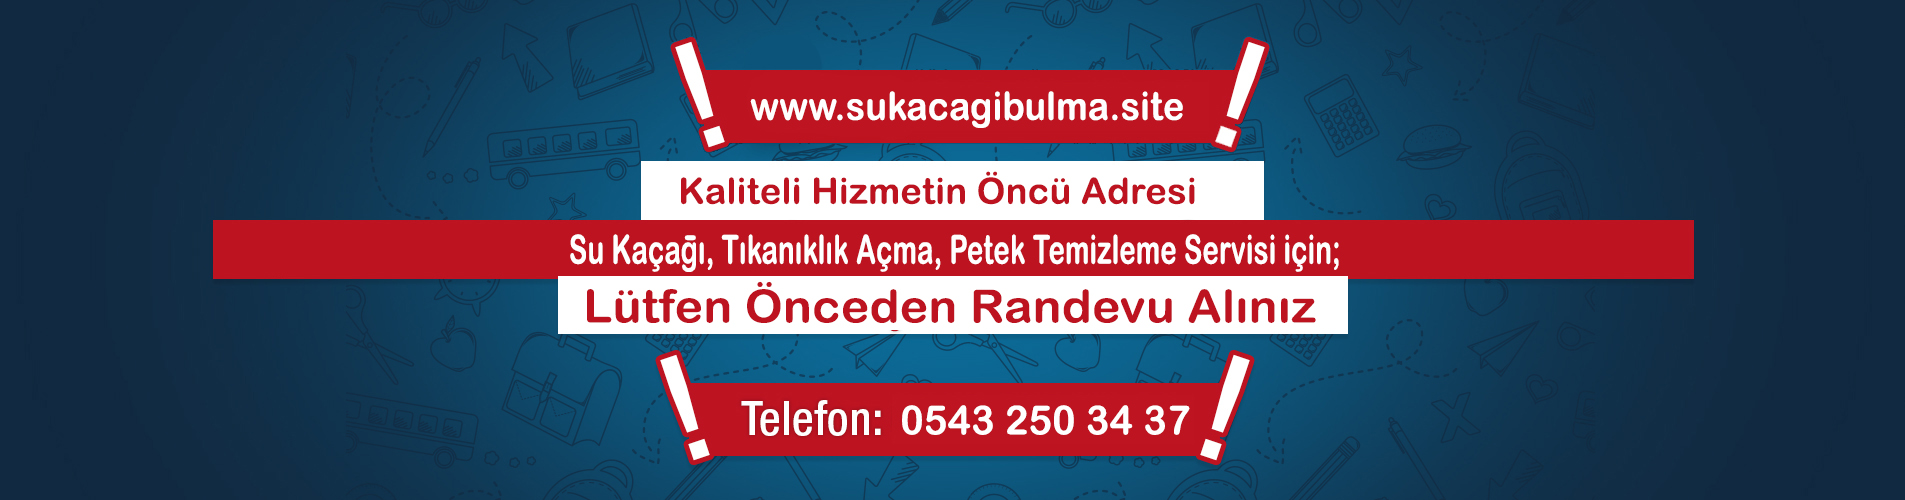 su-kacagi-bulma_tikaniklik-acma_petek-temizleme-hizmeti